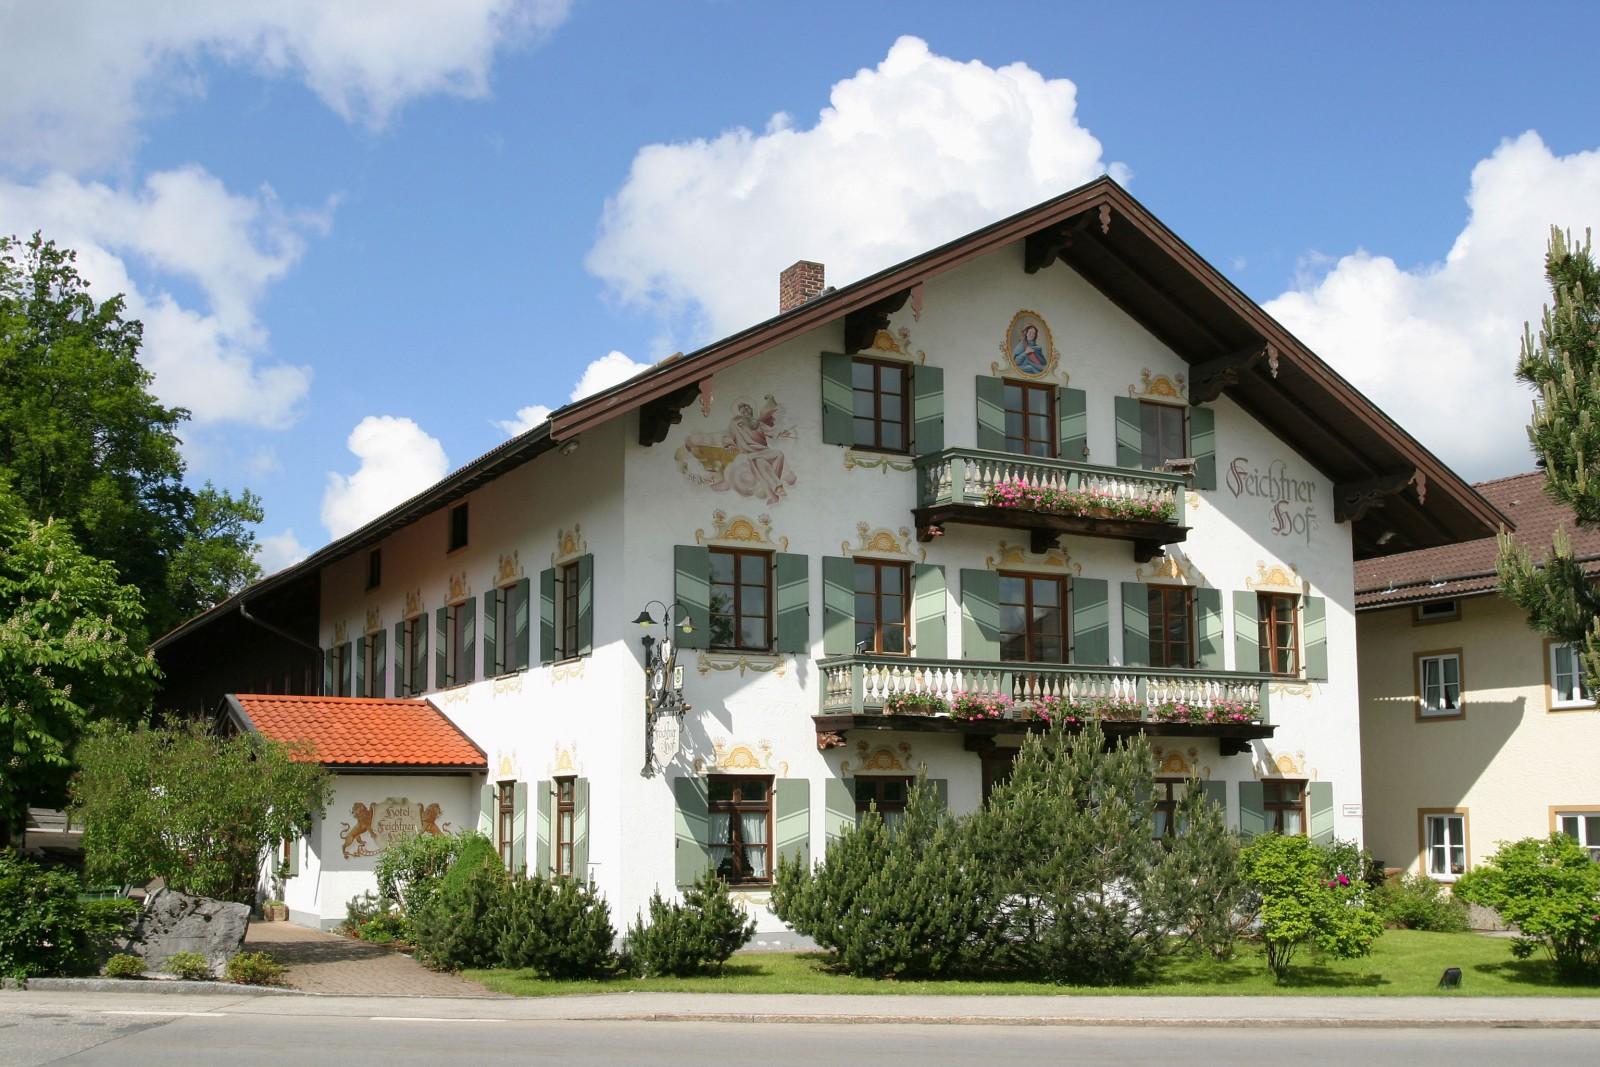 Hotel Feichtner Hof Gmund Tegernsee